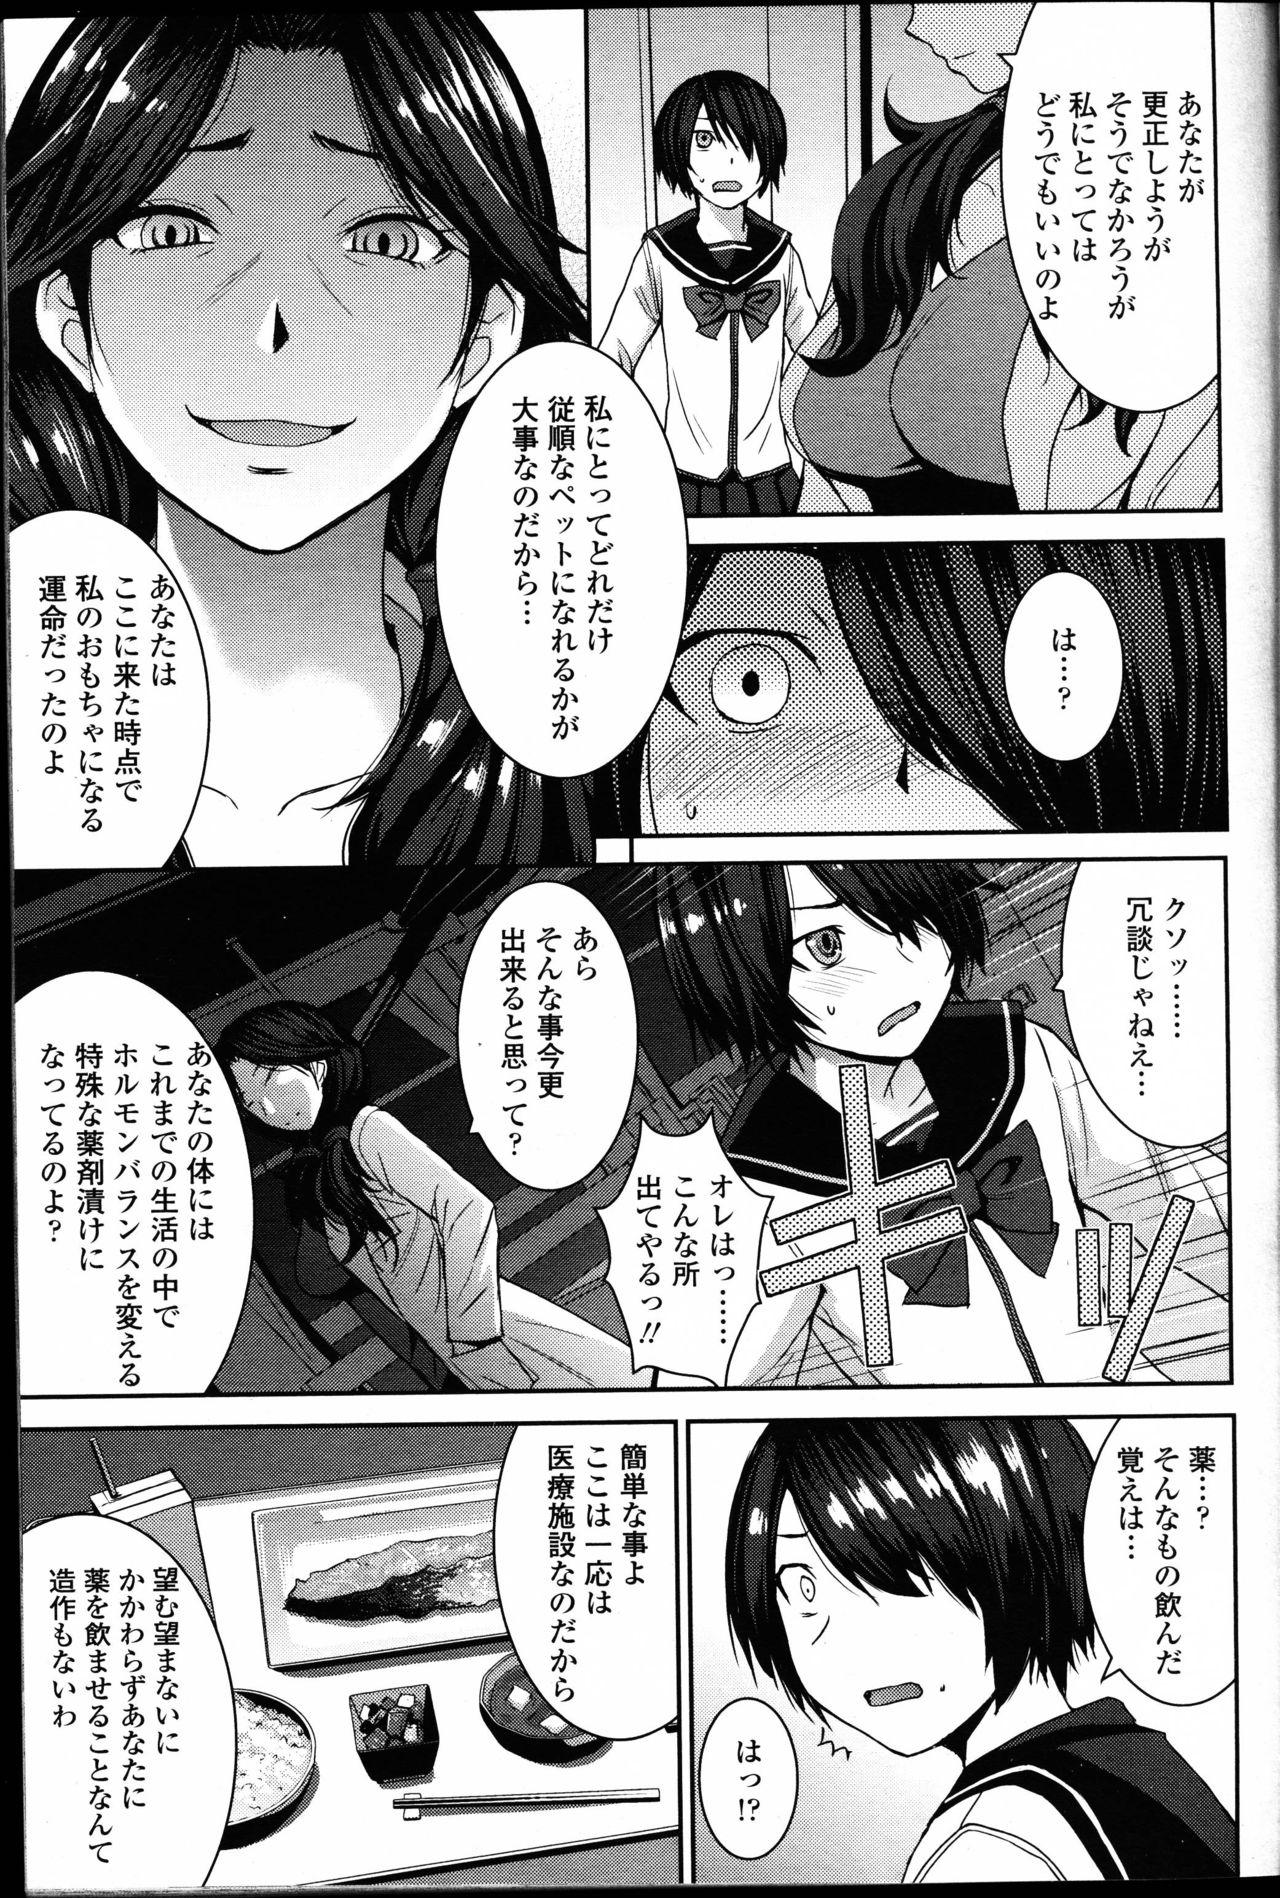 Girls forM Vol. 14 138